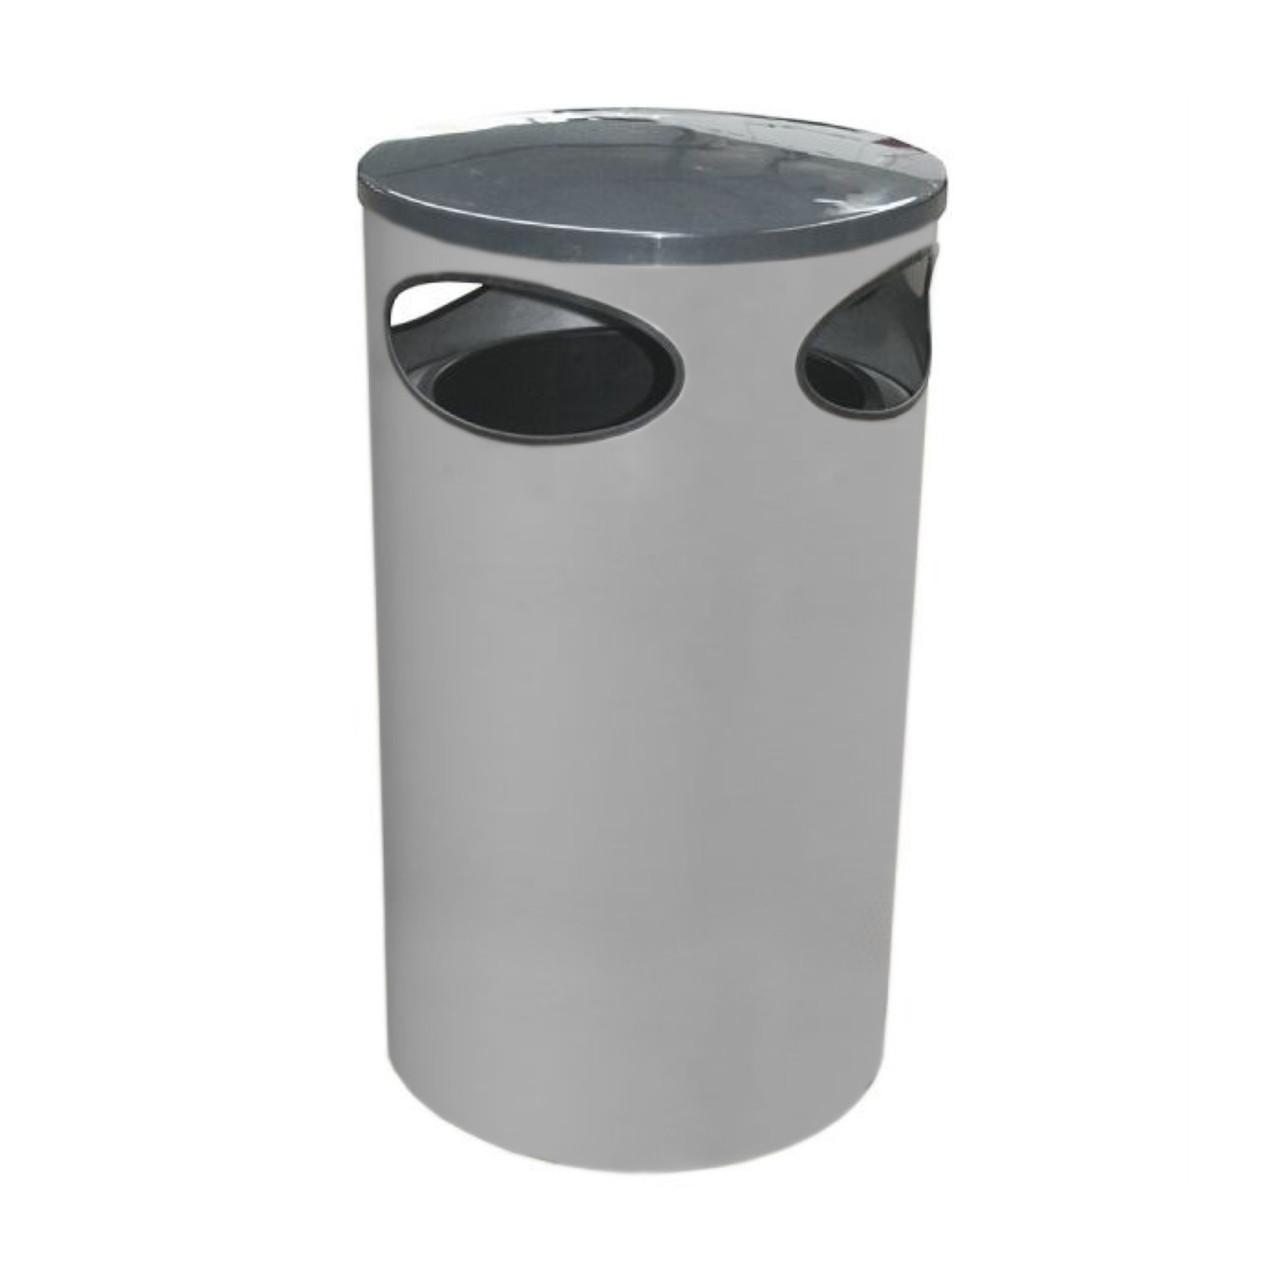 Halo 80 litre blast resistant limited aperture litter bin